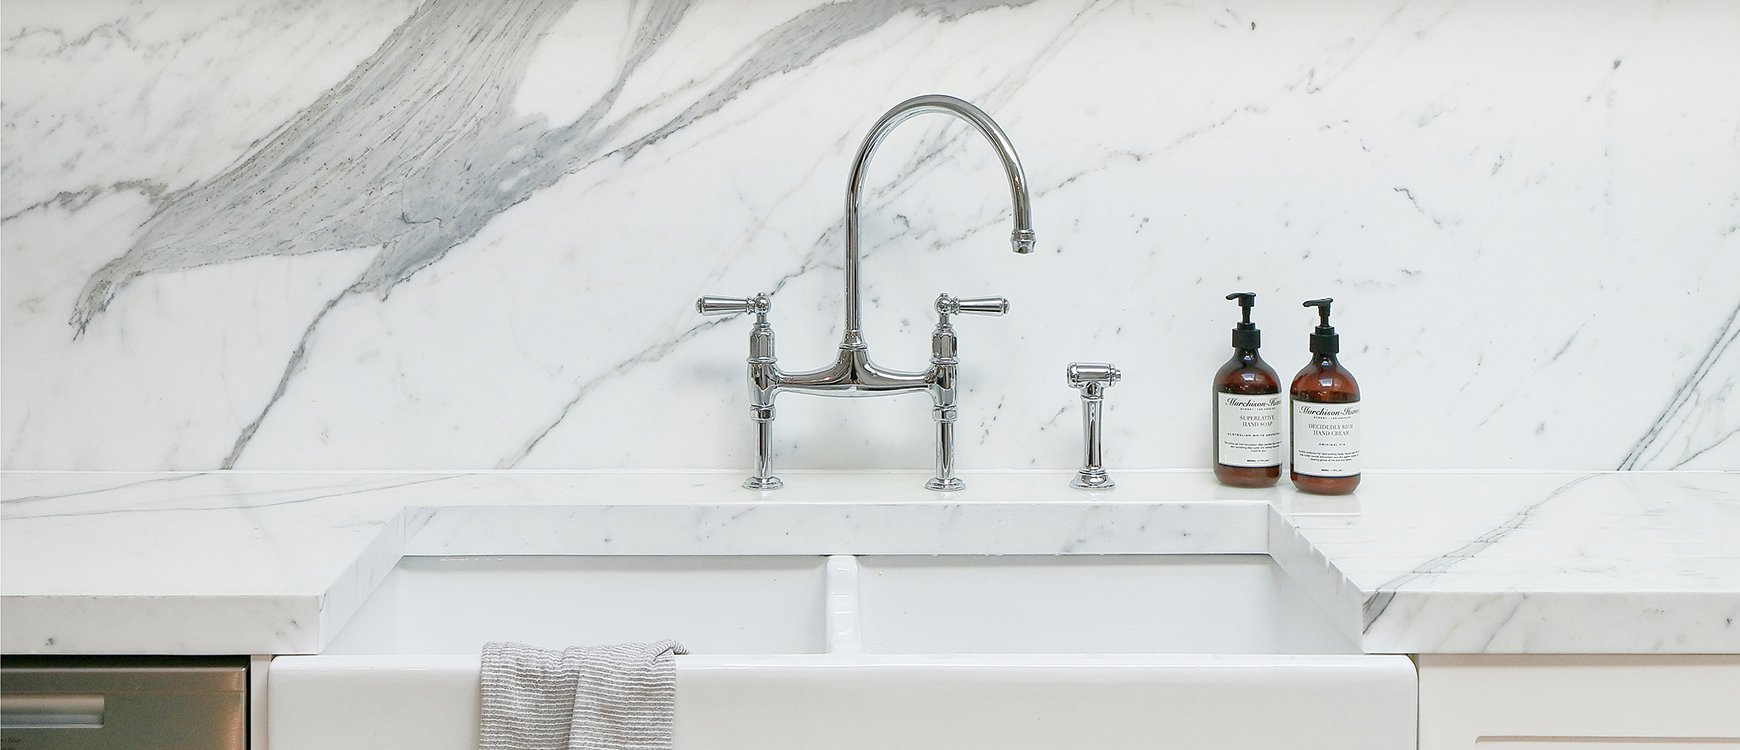 rohl perrin and rowe bridge ionian kitchen faucet w side spray u 4718 u 4719